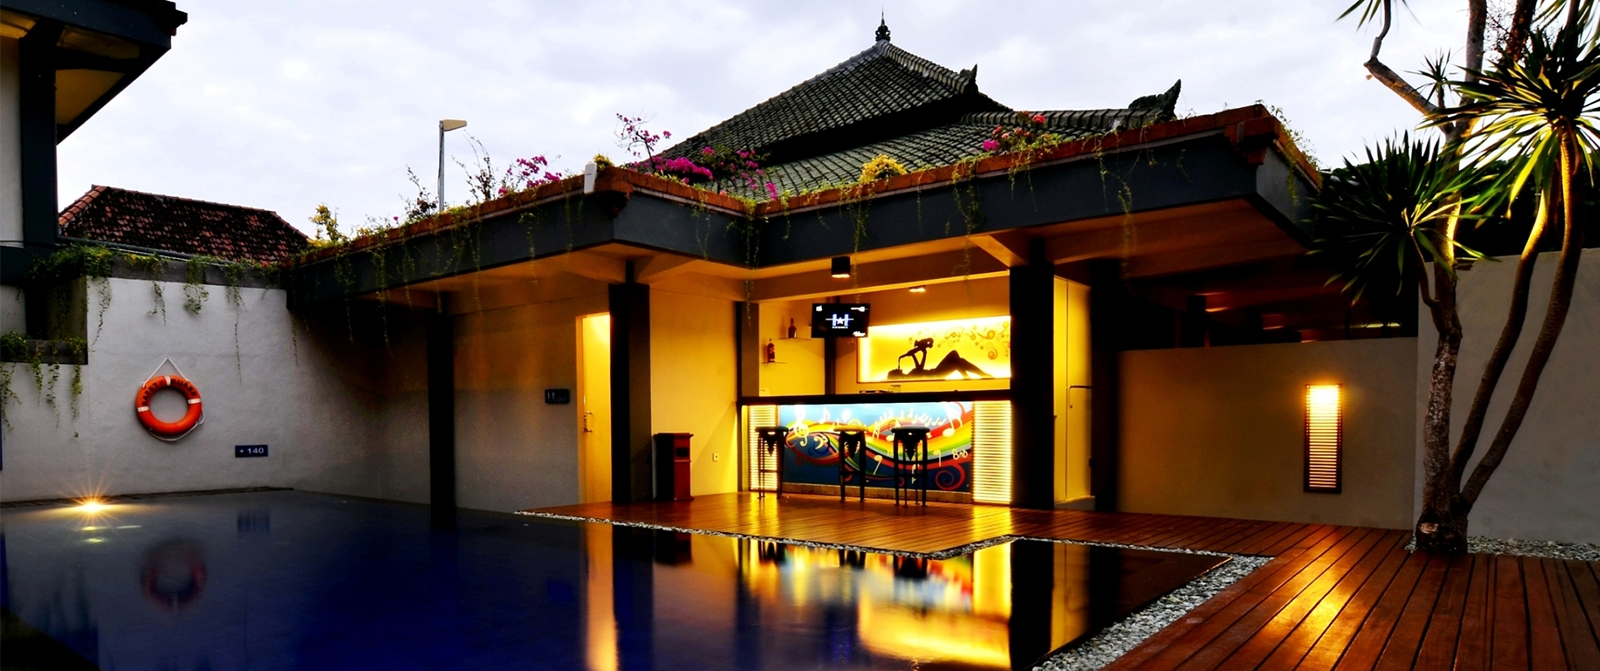 Yani Hotel The Choice To Stay At Bali